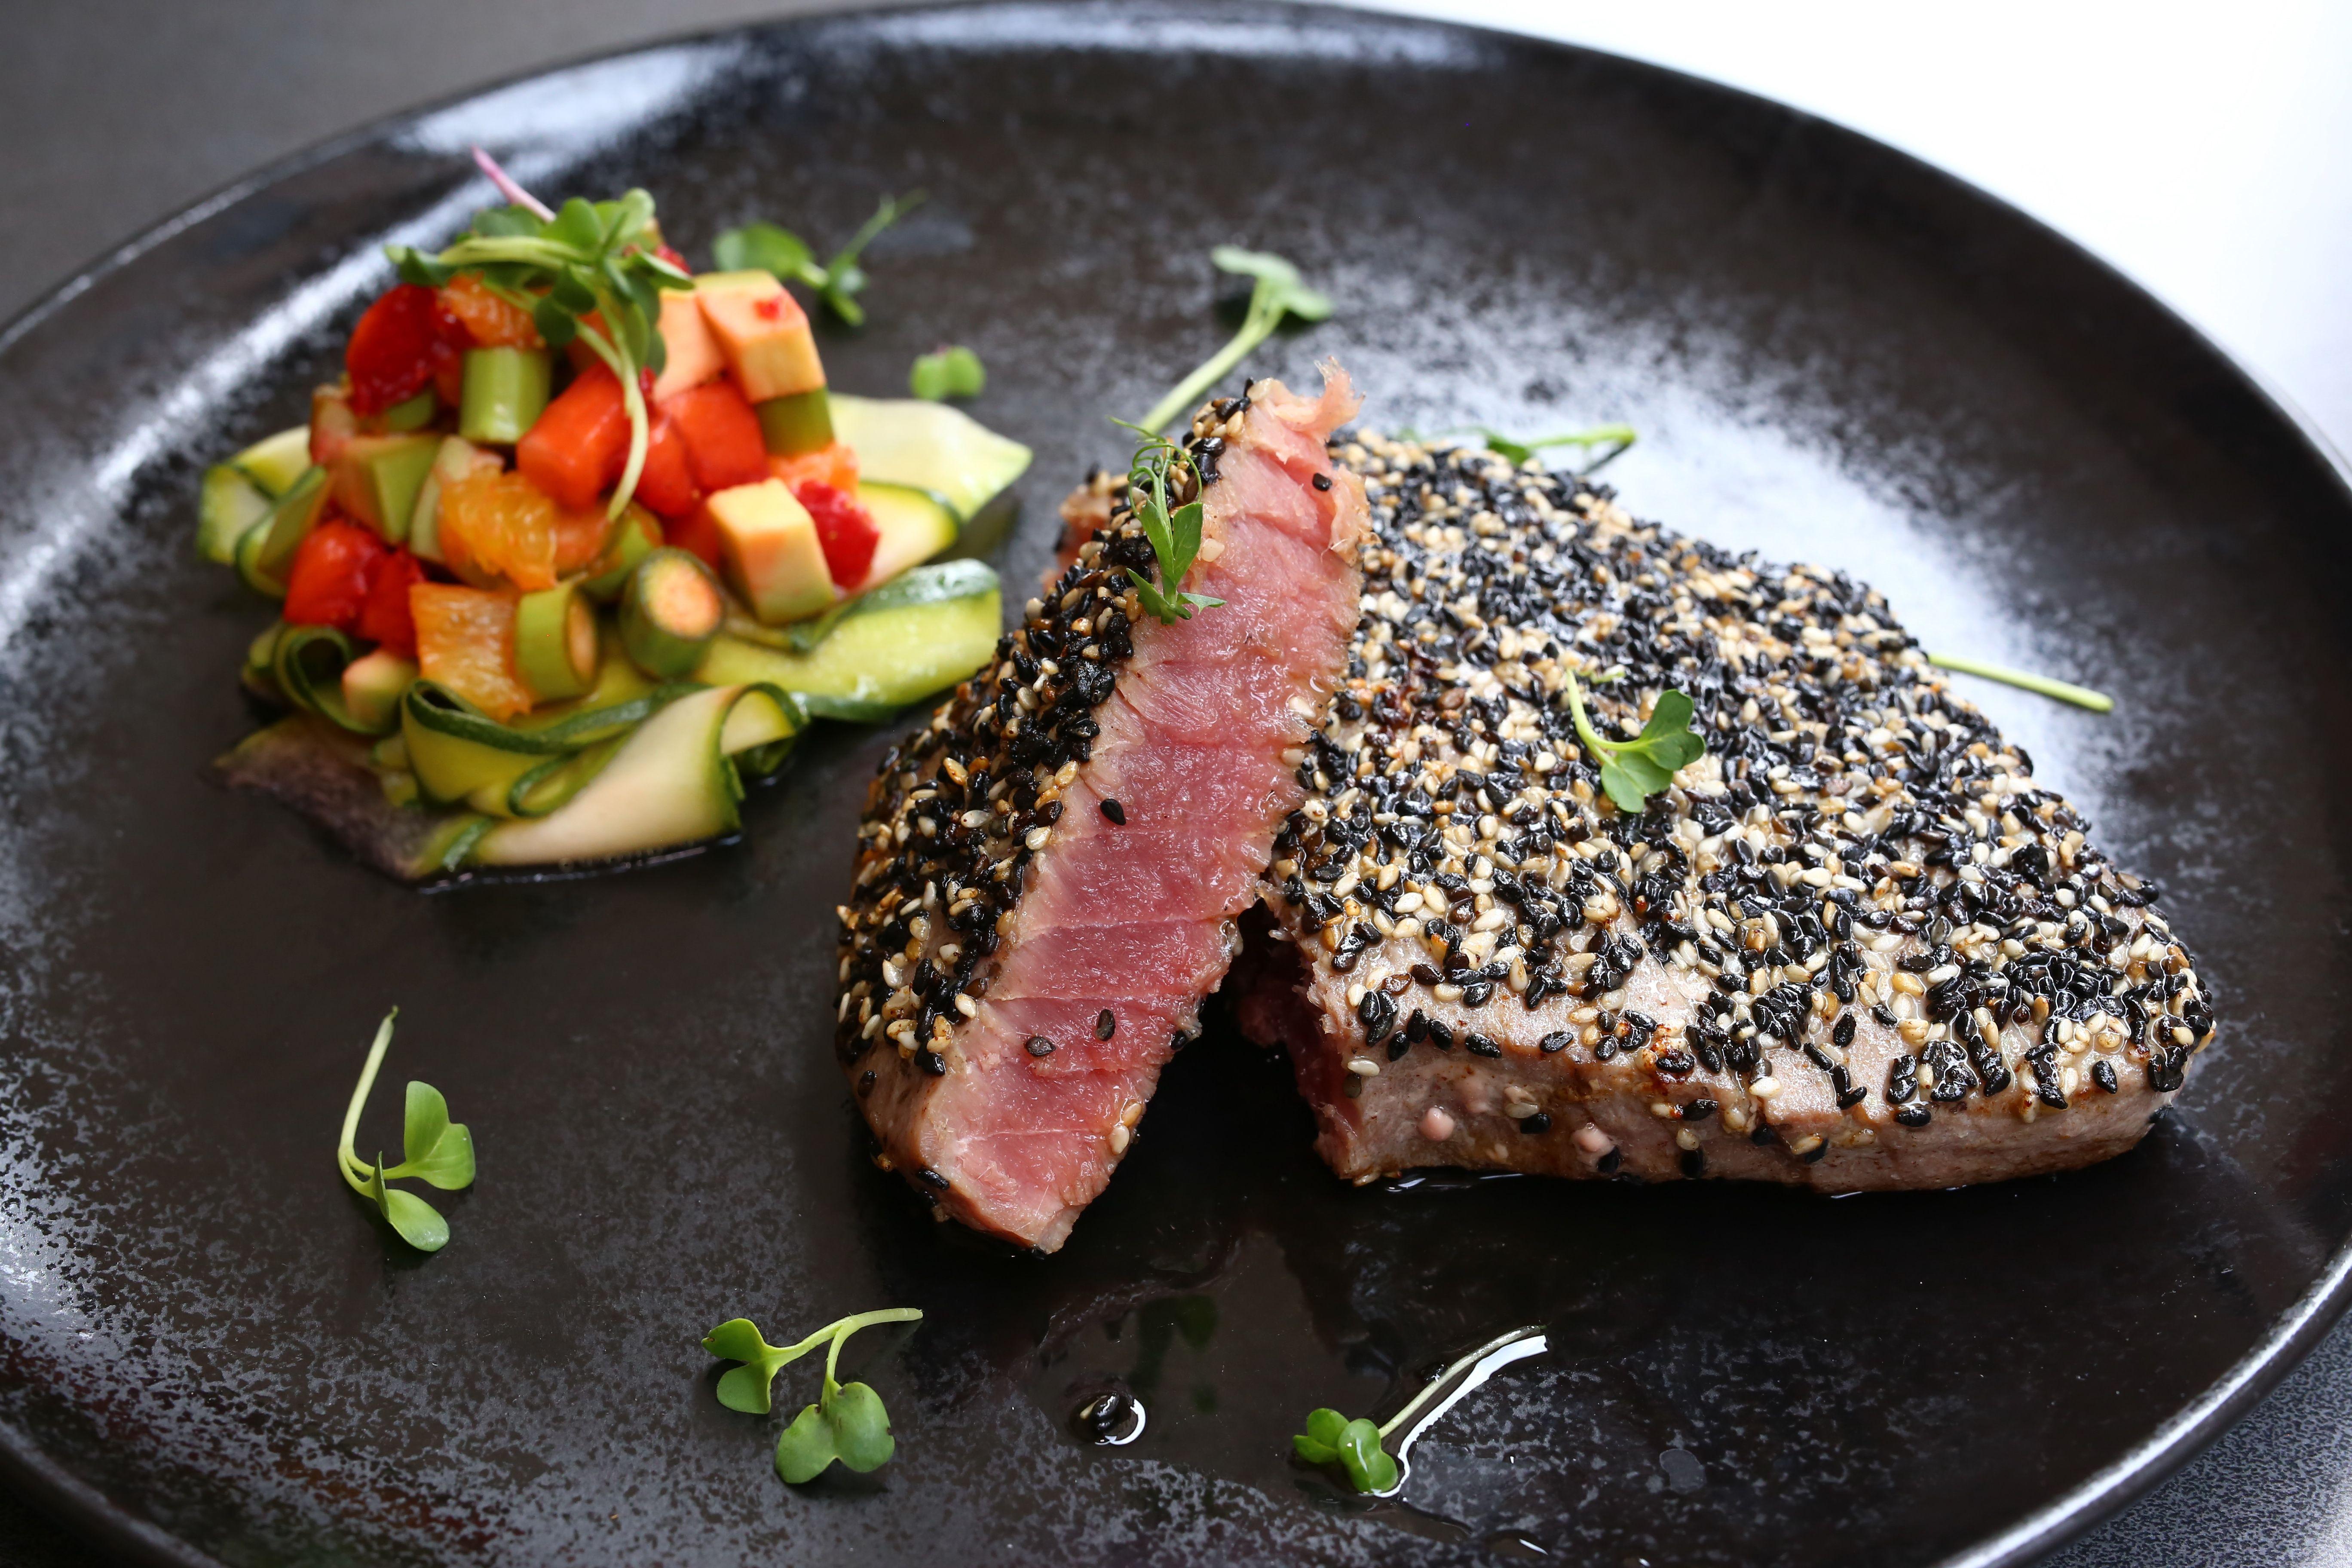 Fresh Tuna Steak Fresh Freshtuna Steak Tunasteak Staripisker Celje Slovenia Food Foodie Nom Food Tuna Steak